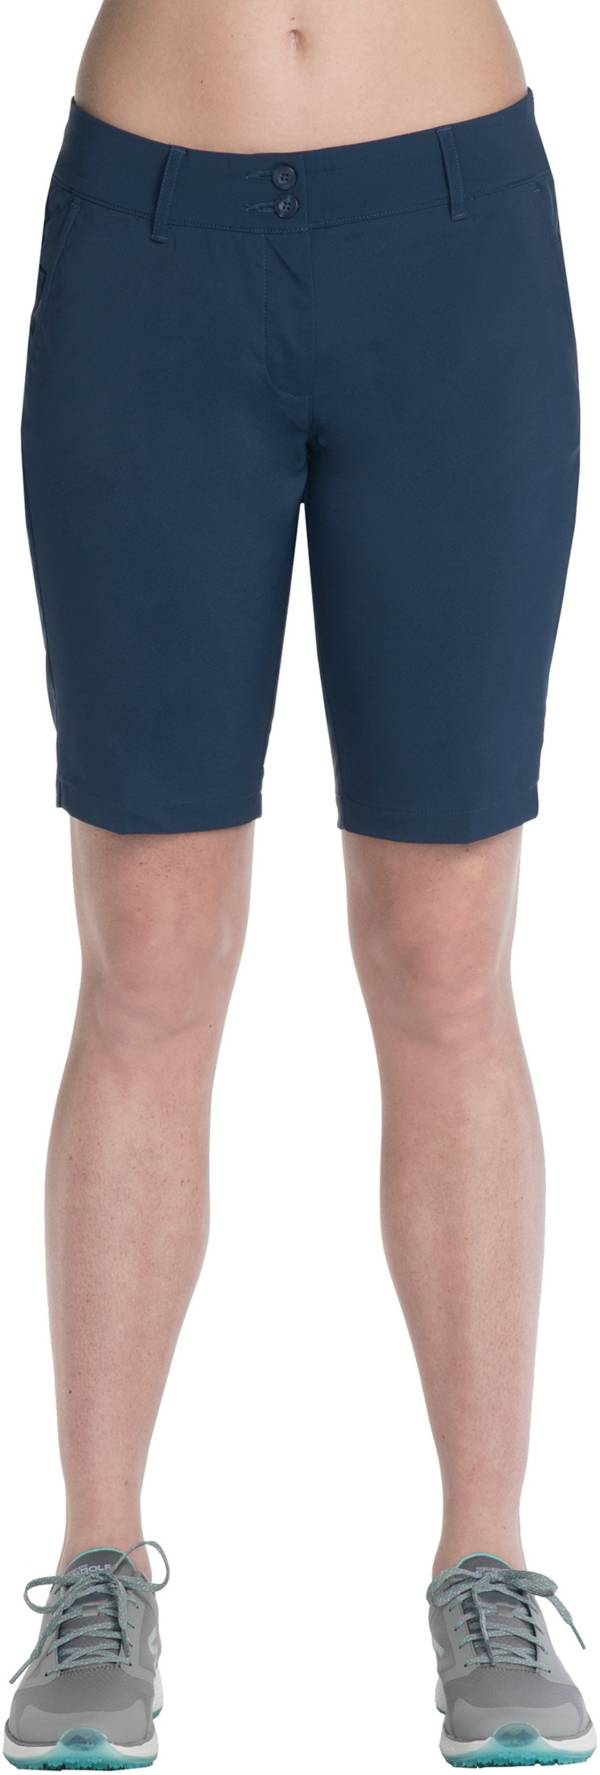 Skechers Women's Go Golf High Side Bermuda Golf Shorts product image